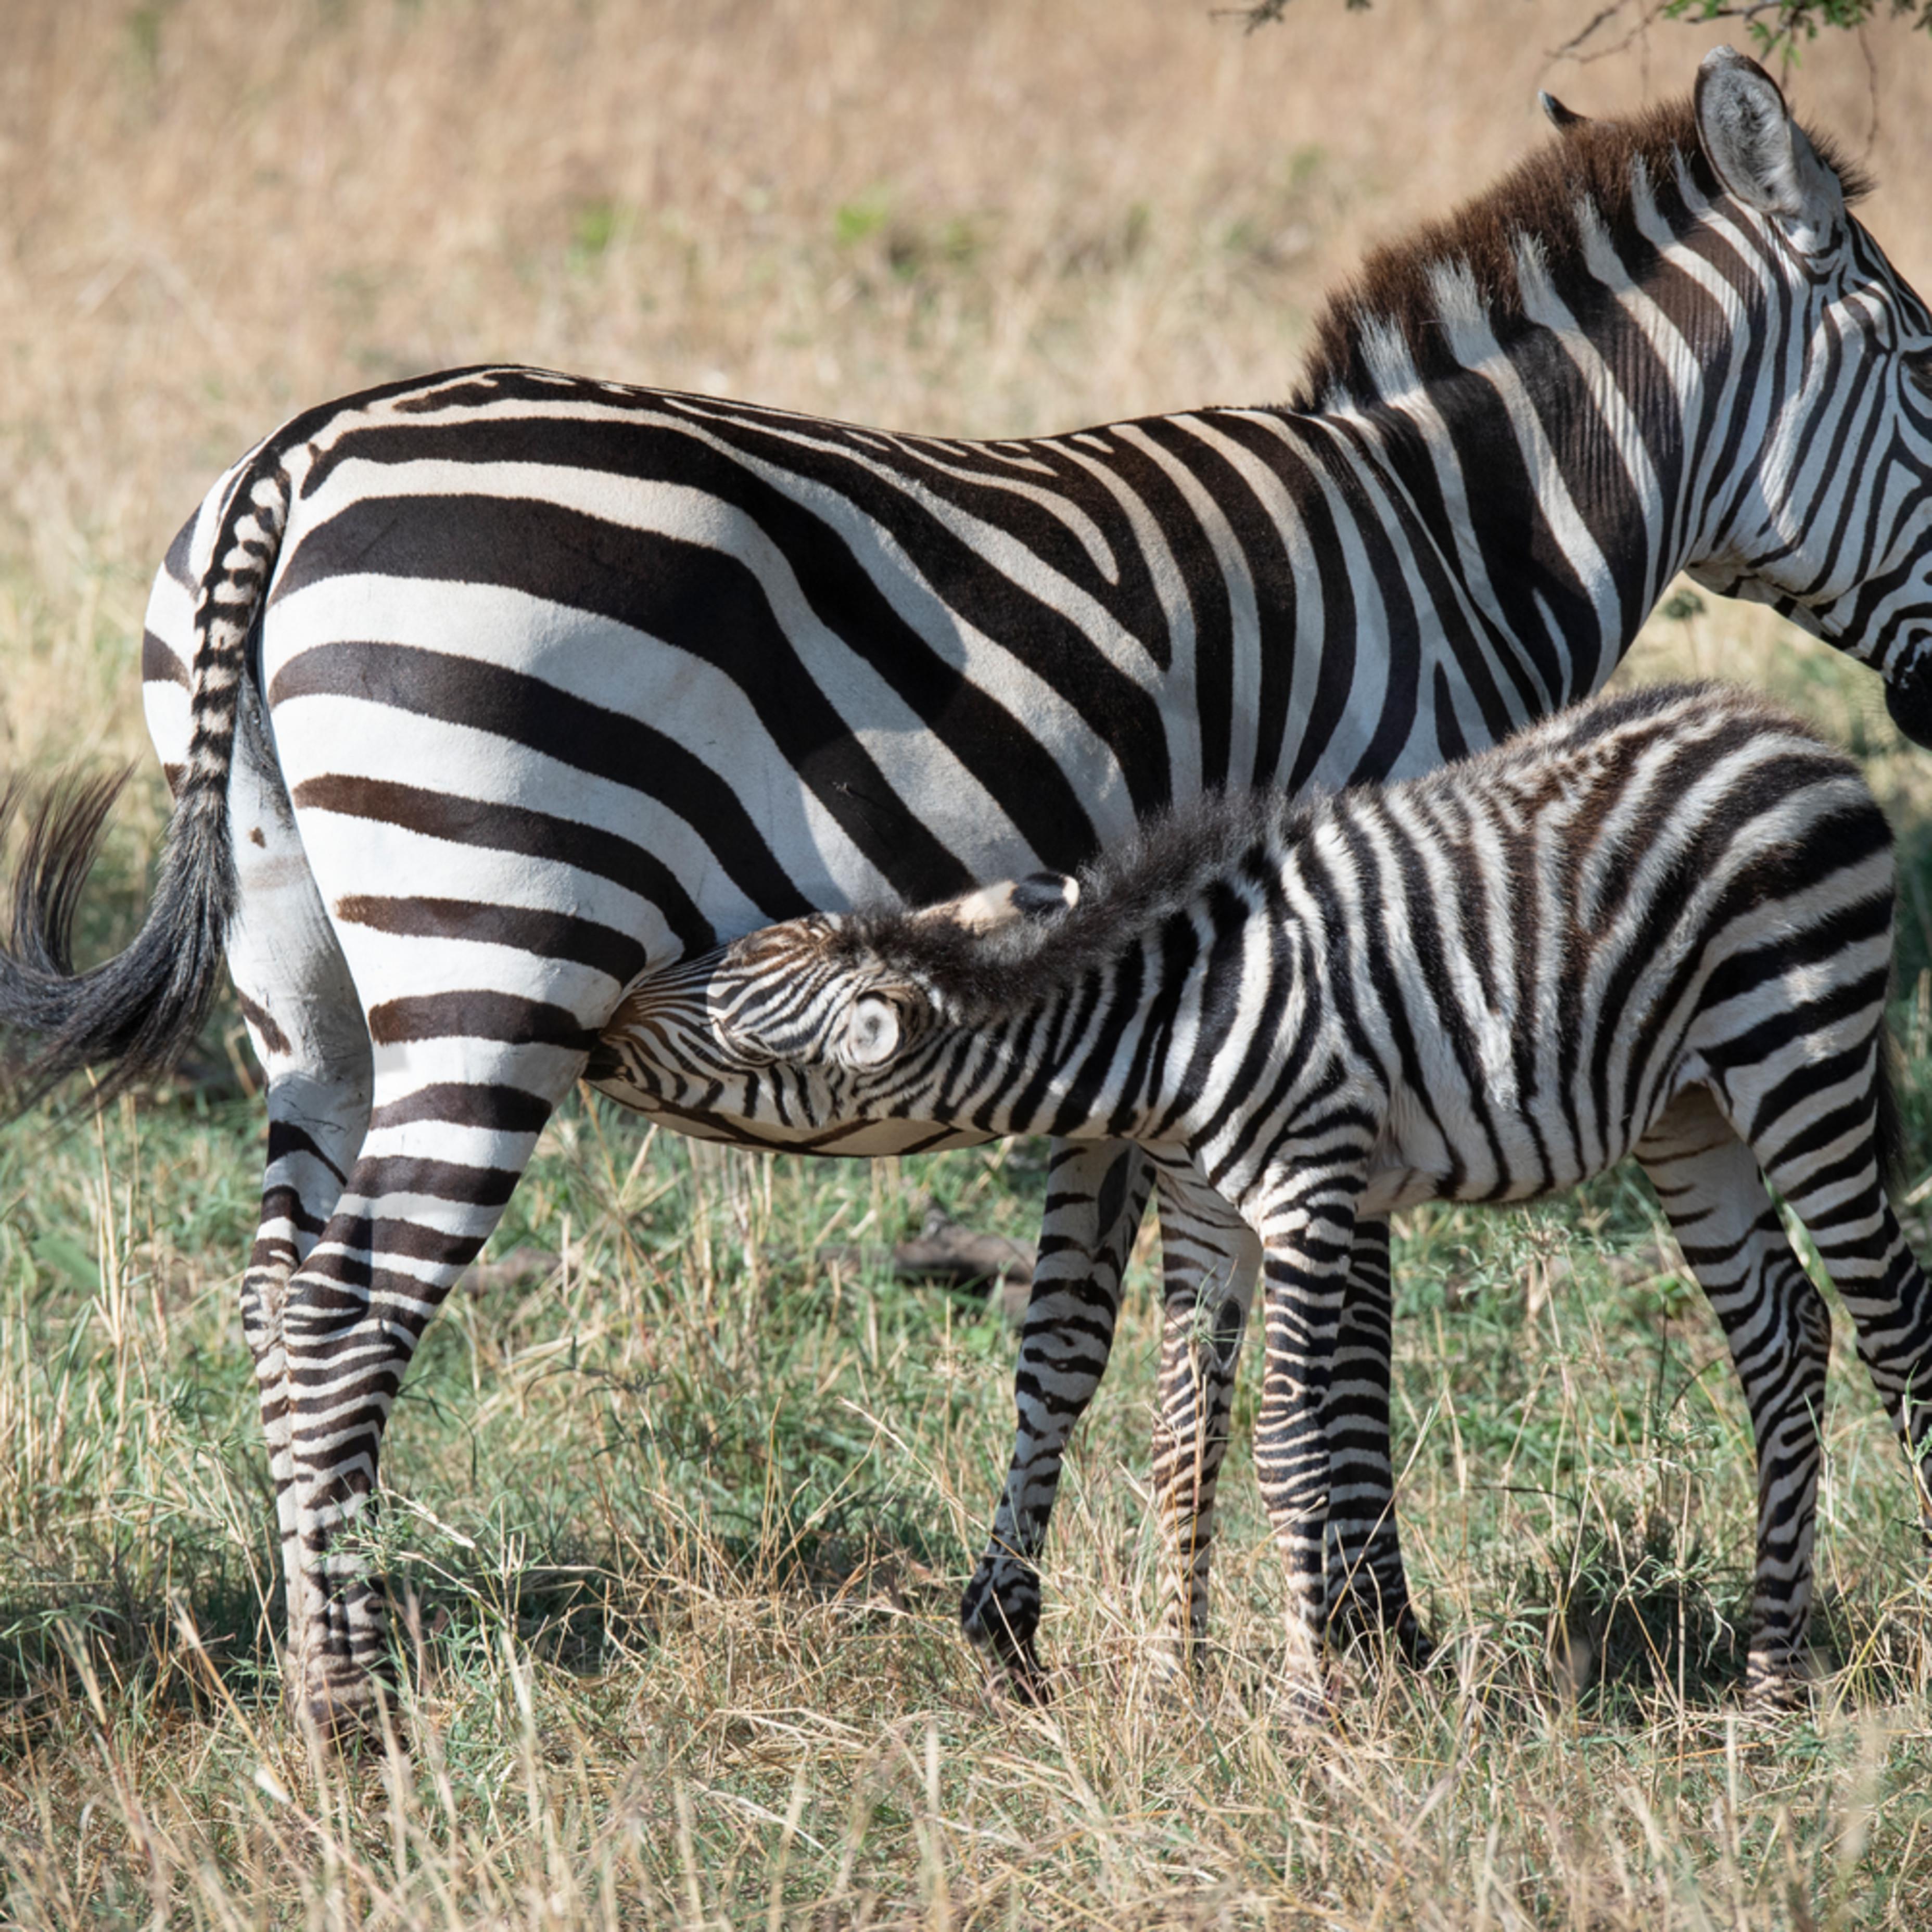 Jps zebra nursing nfkbzf